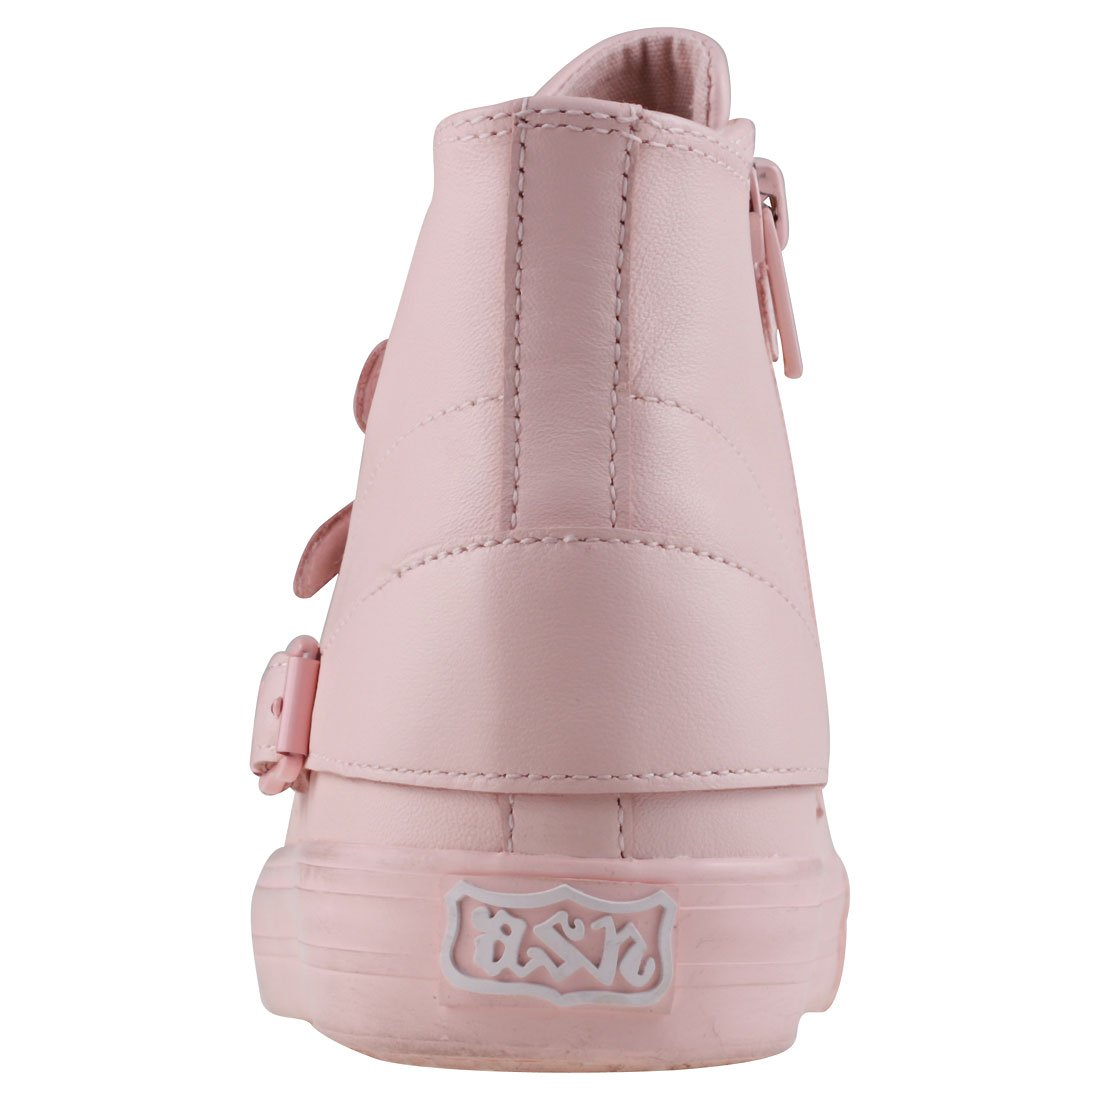 Ash En Venus Cuir Powder Femme Chaussures W2IDE9YH